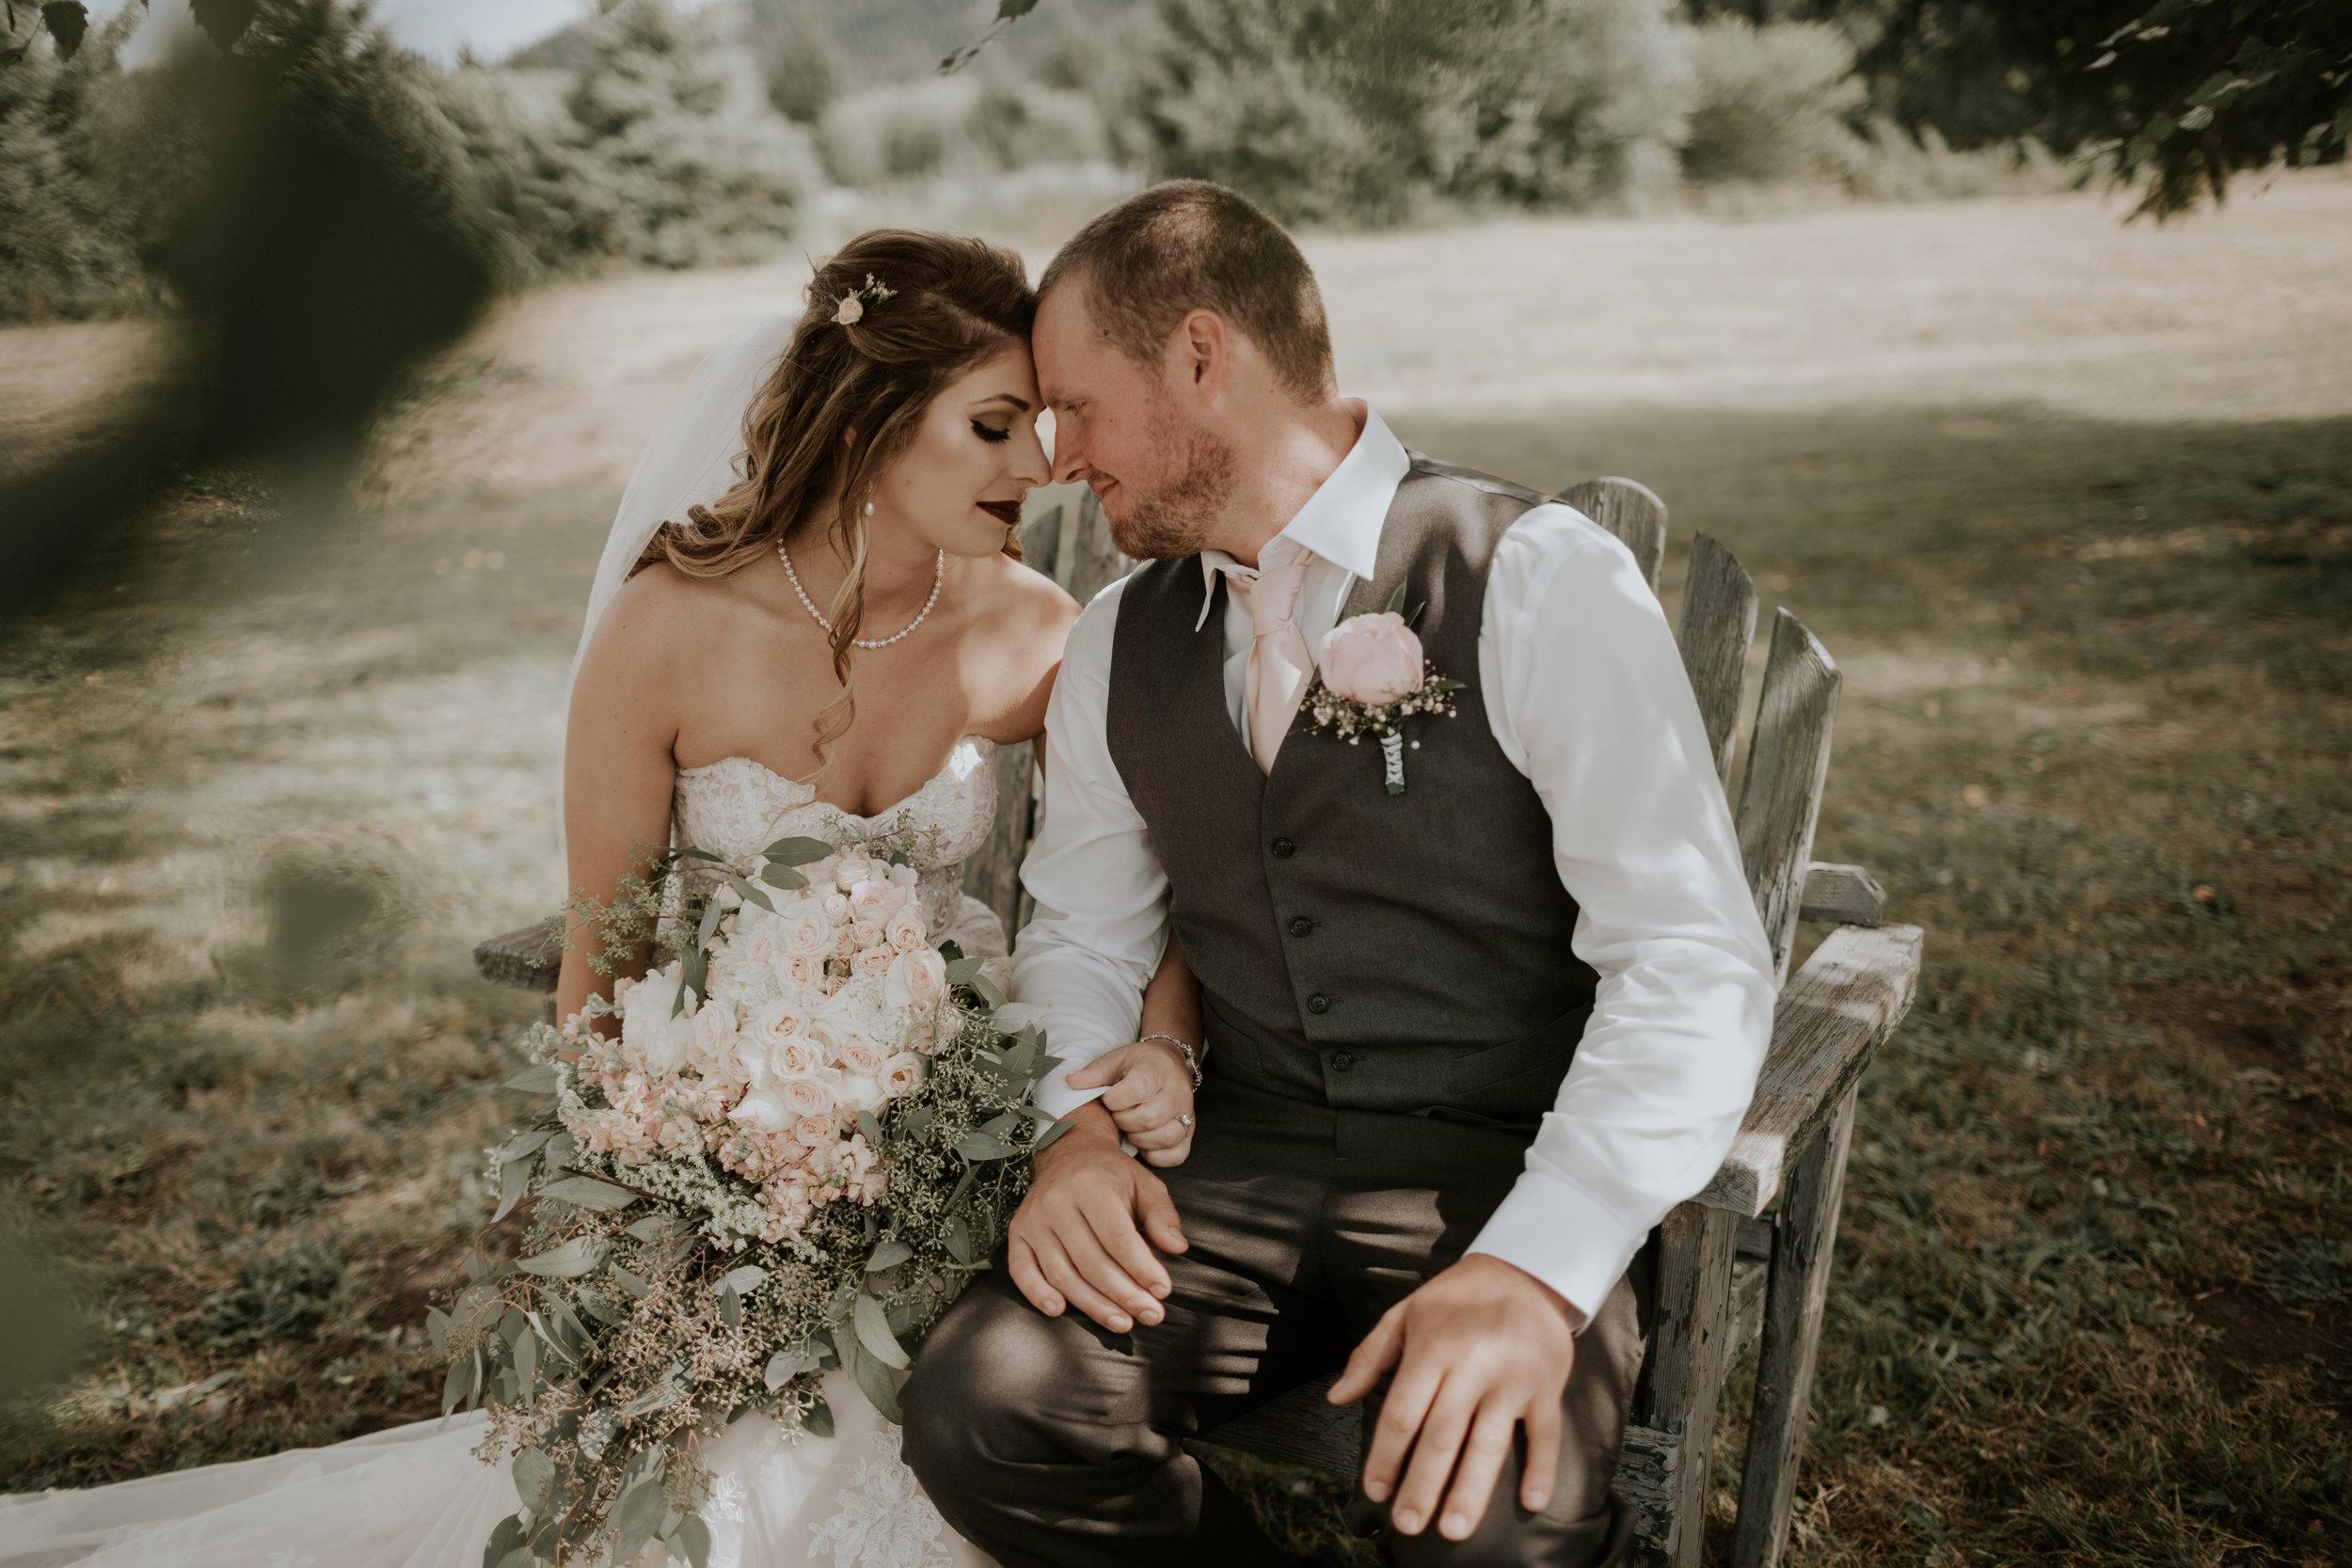 Olympic-Peninsula-Wedding-Photographer-PNW-Forks-Port-Angeles-Kayla-Dawn-Photography-engagement-Olympic-National-Park-143.jpg